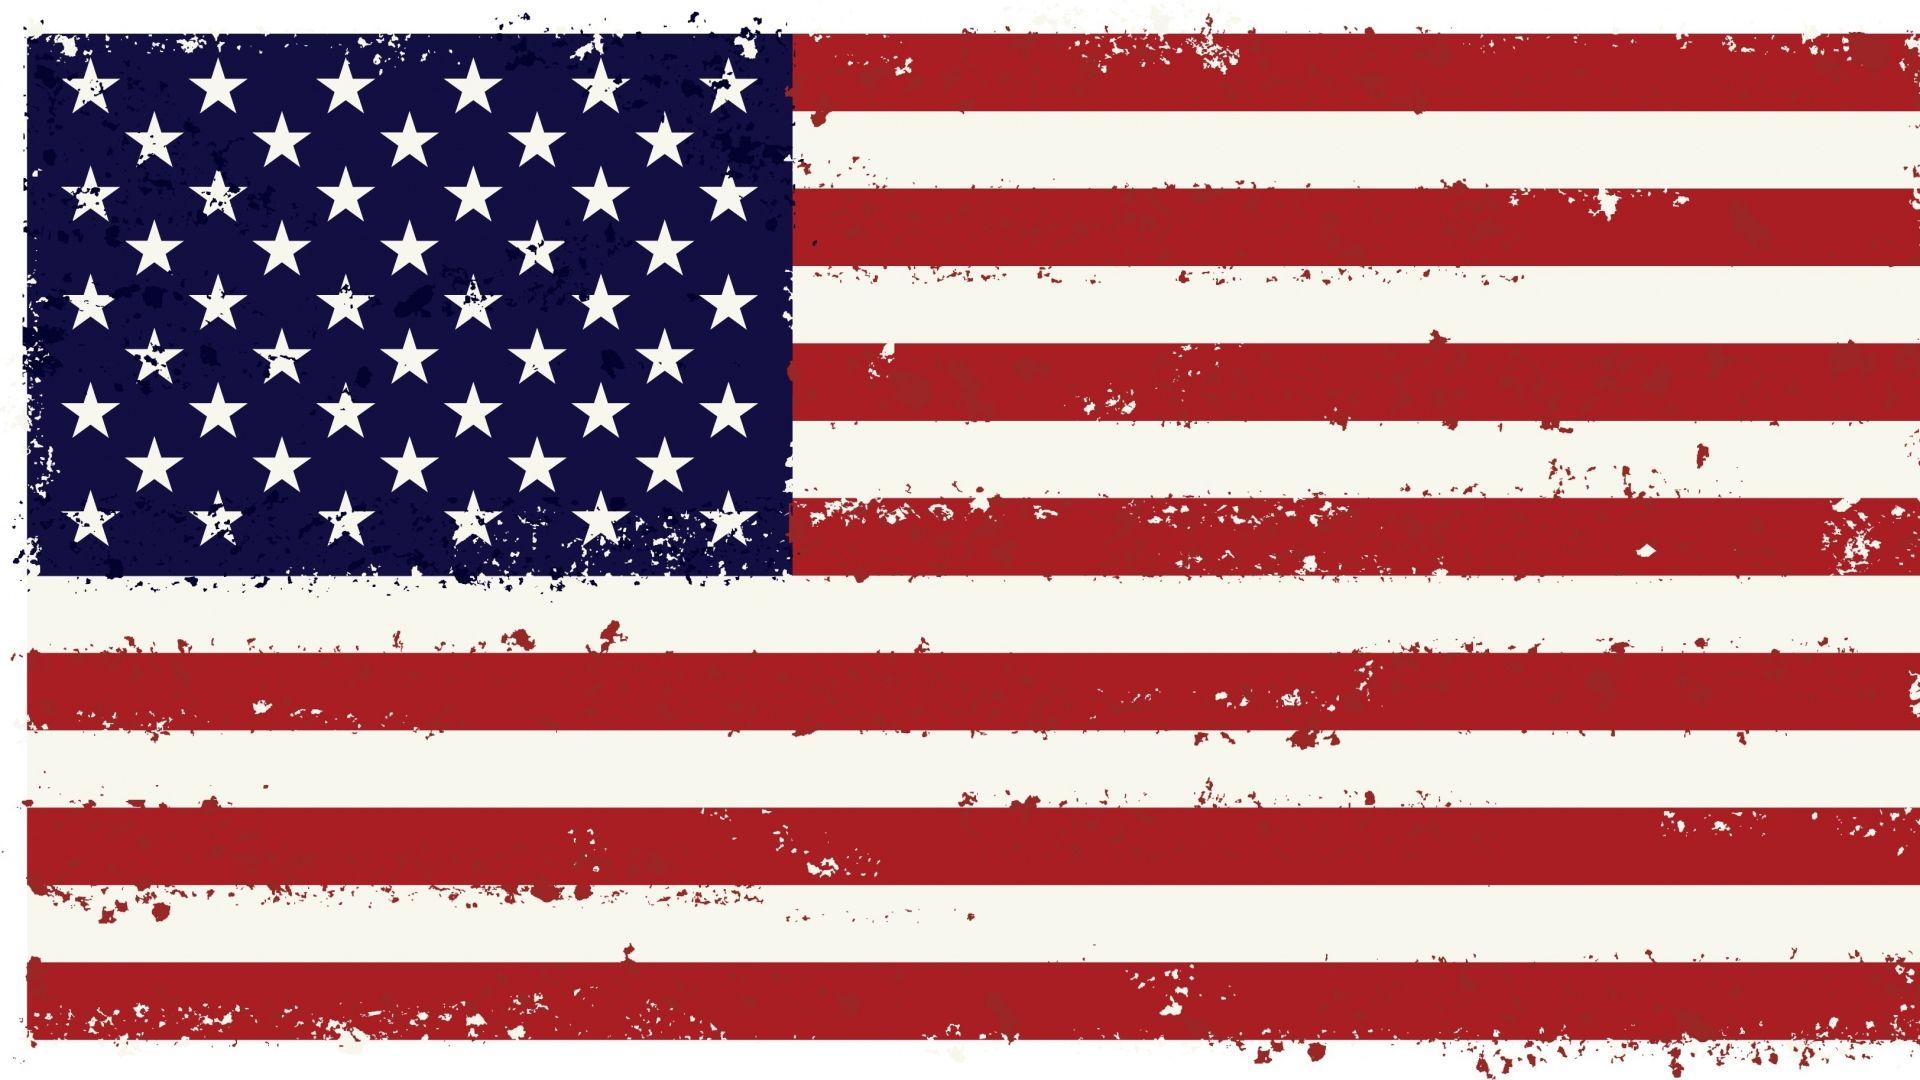 Flag United States United States Of America Http Www Wallpapers4u Org Flag United States United States Of Am Usa Flag Wallpaper American Flag Images Flag